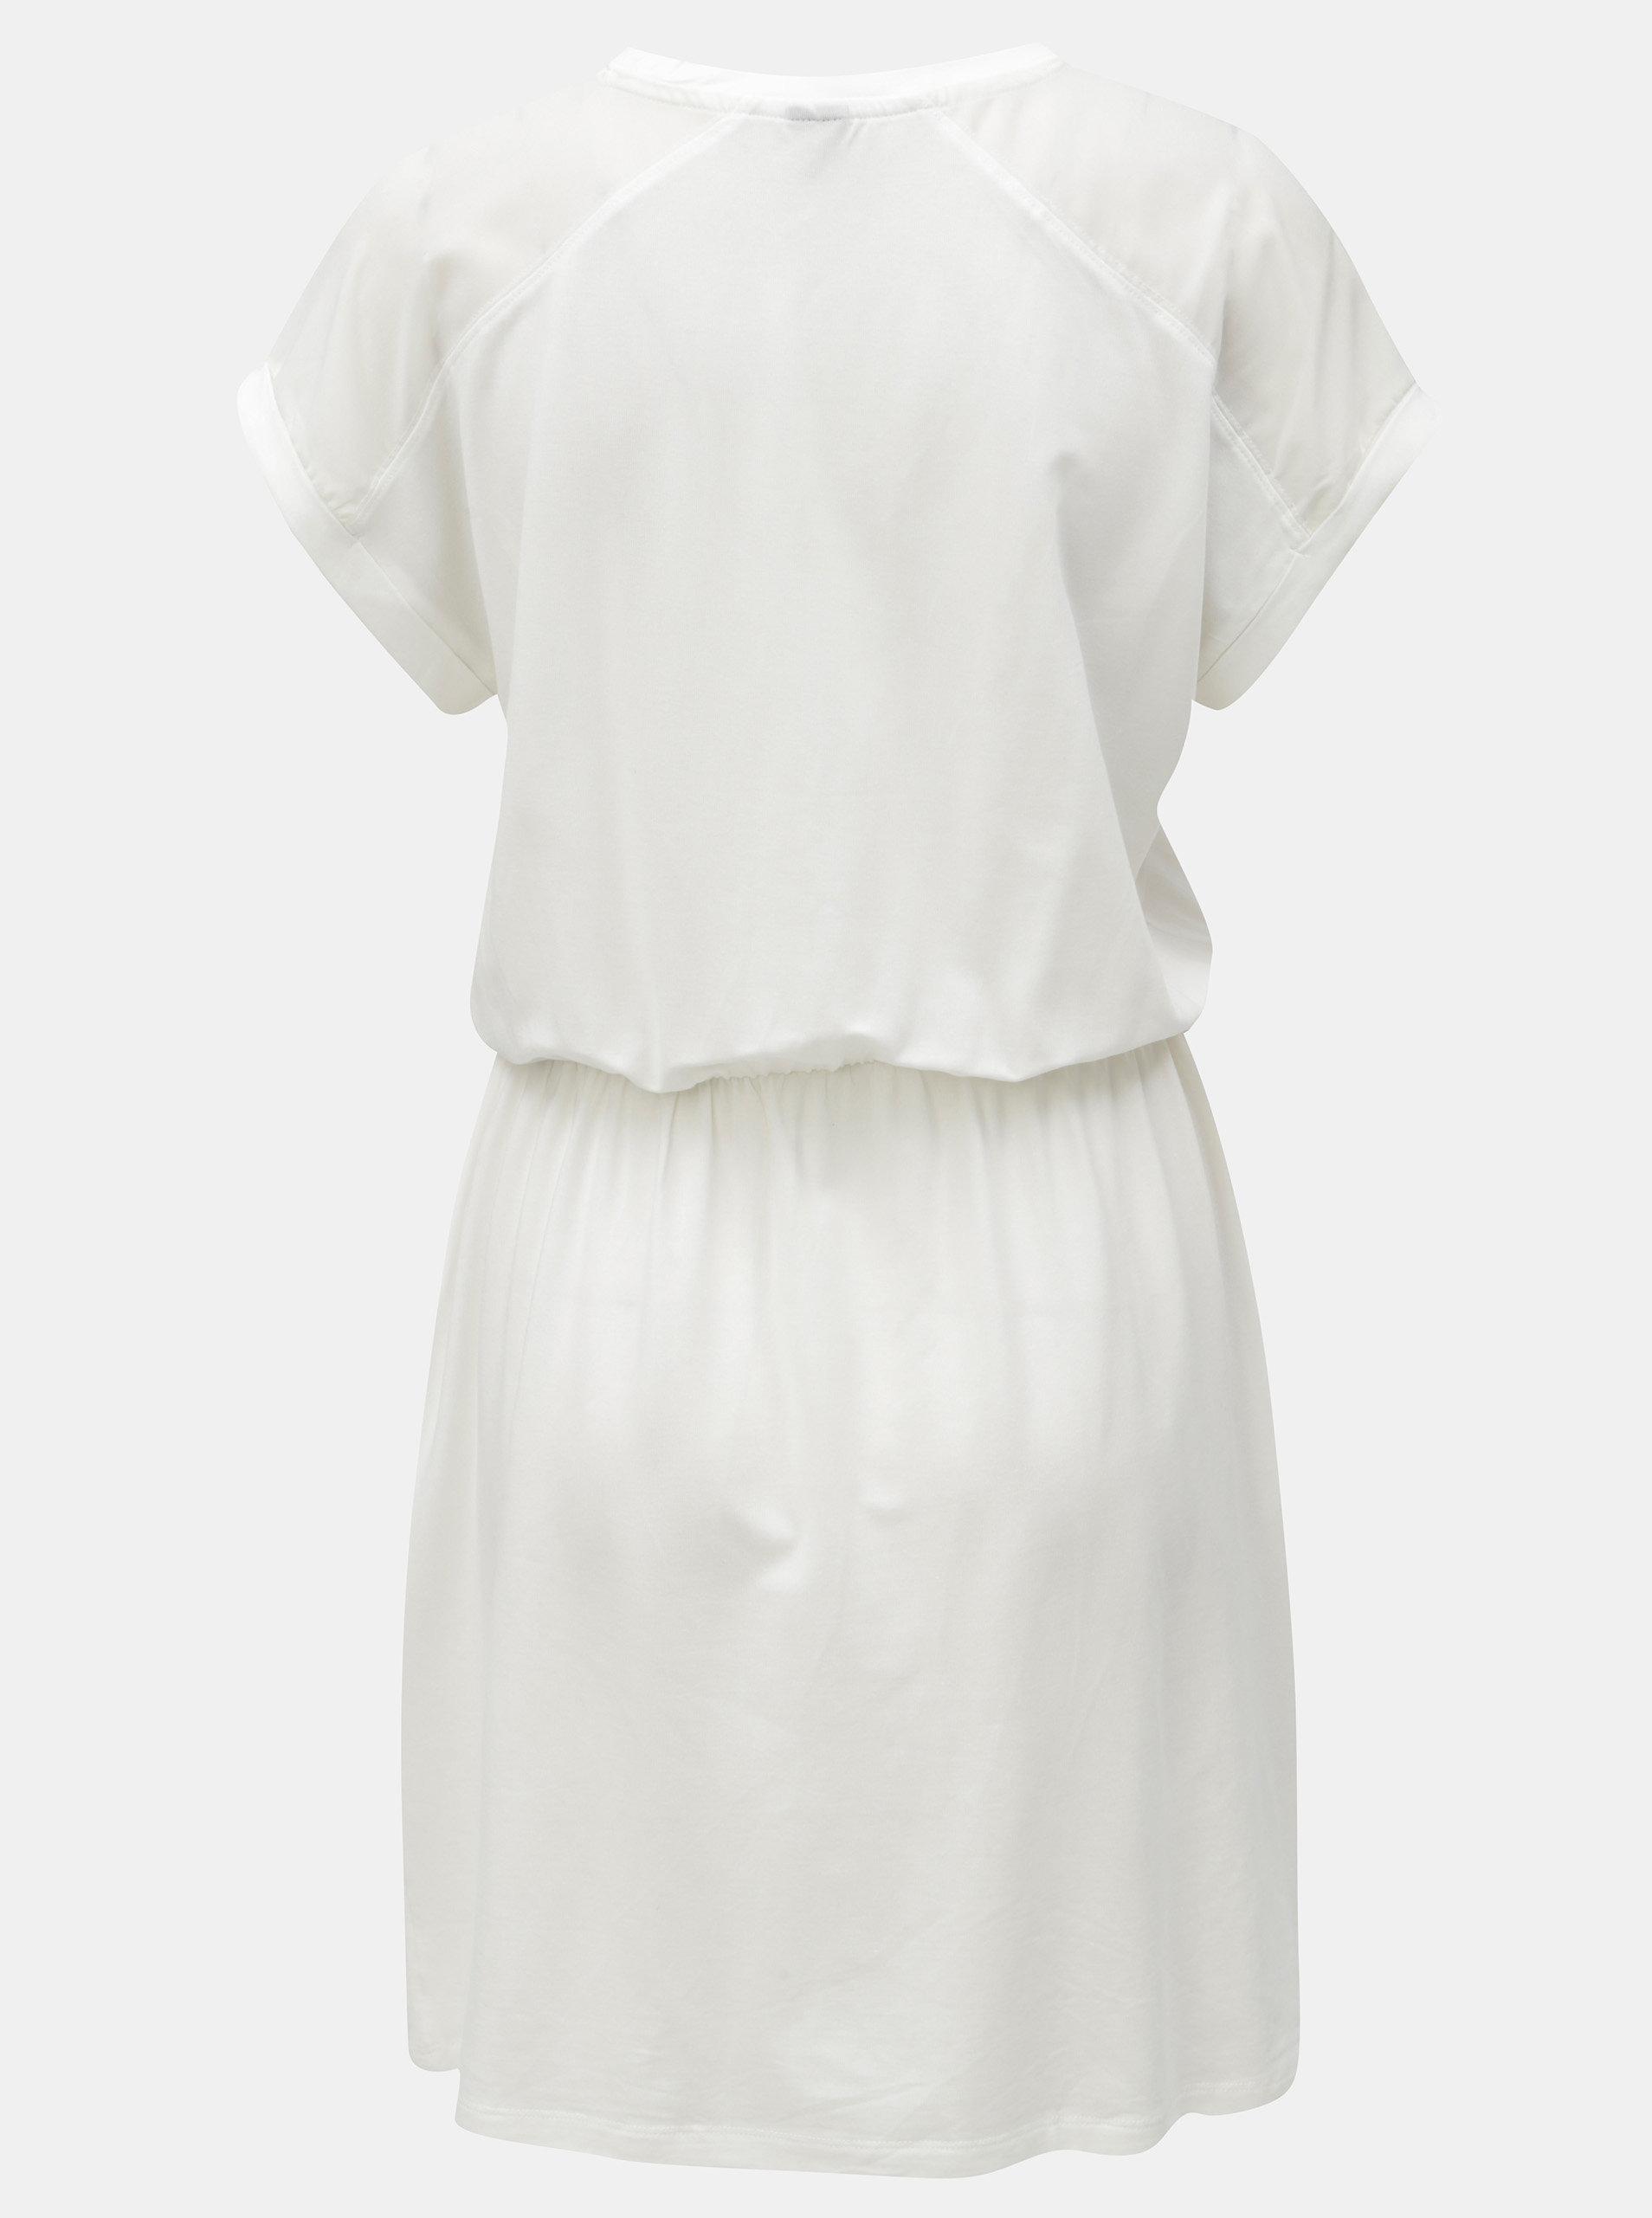 e6574c0e79d Bílé šaty s kapsami VERO MODA Ava ...